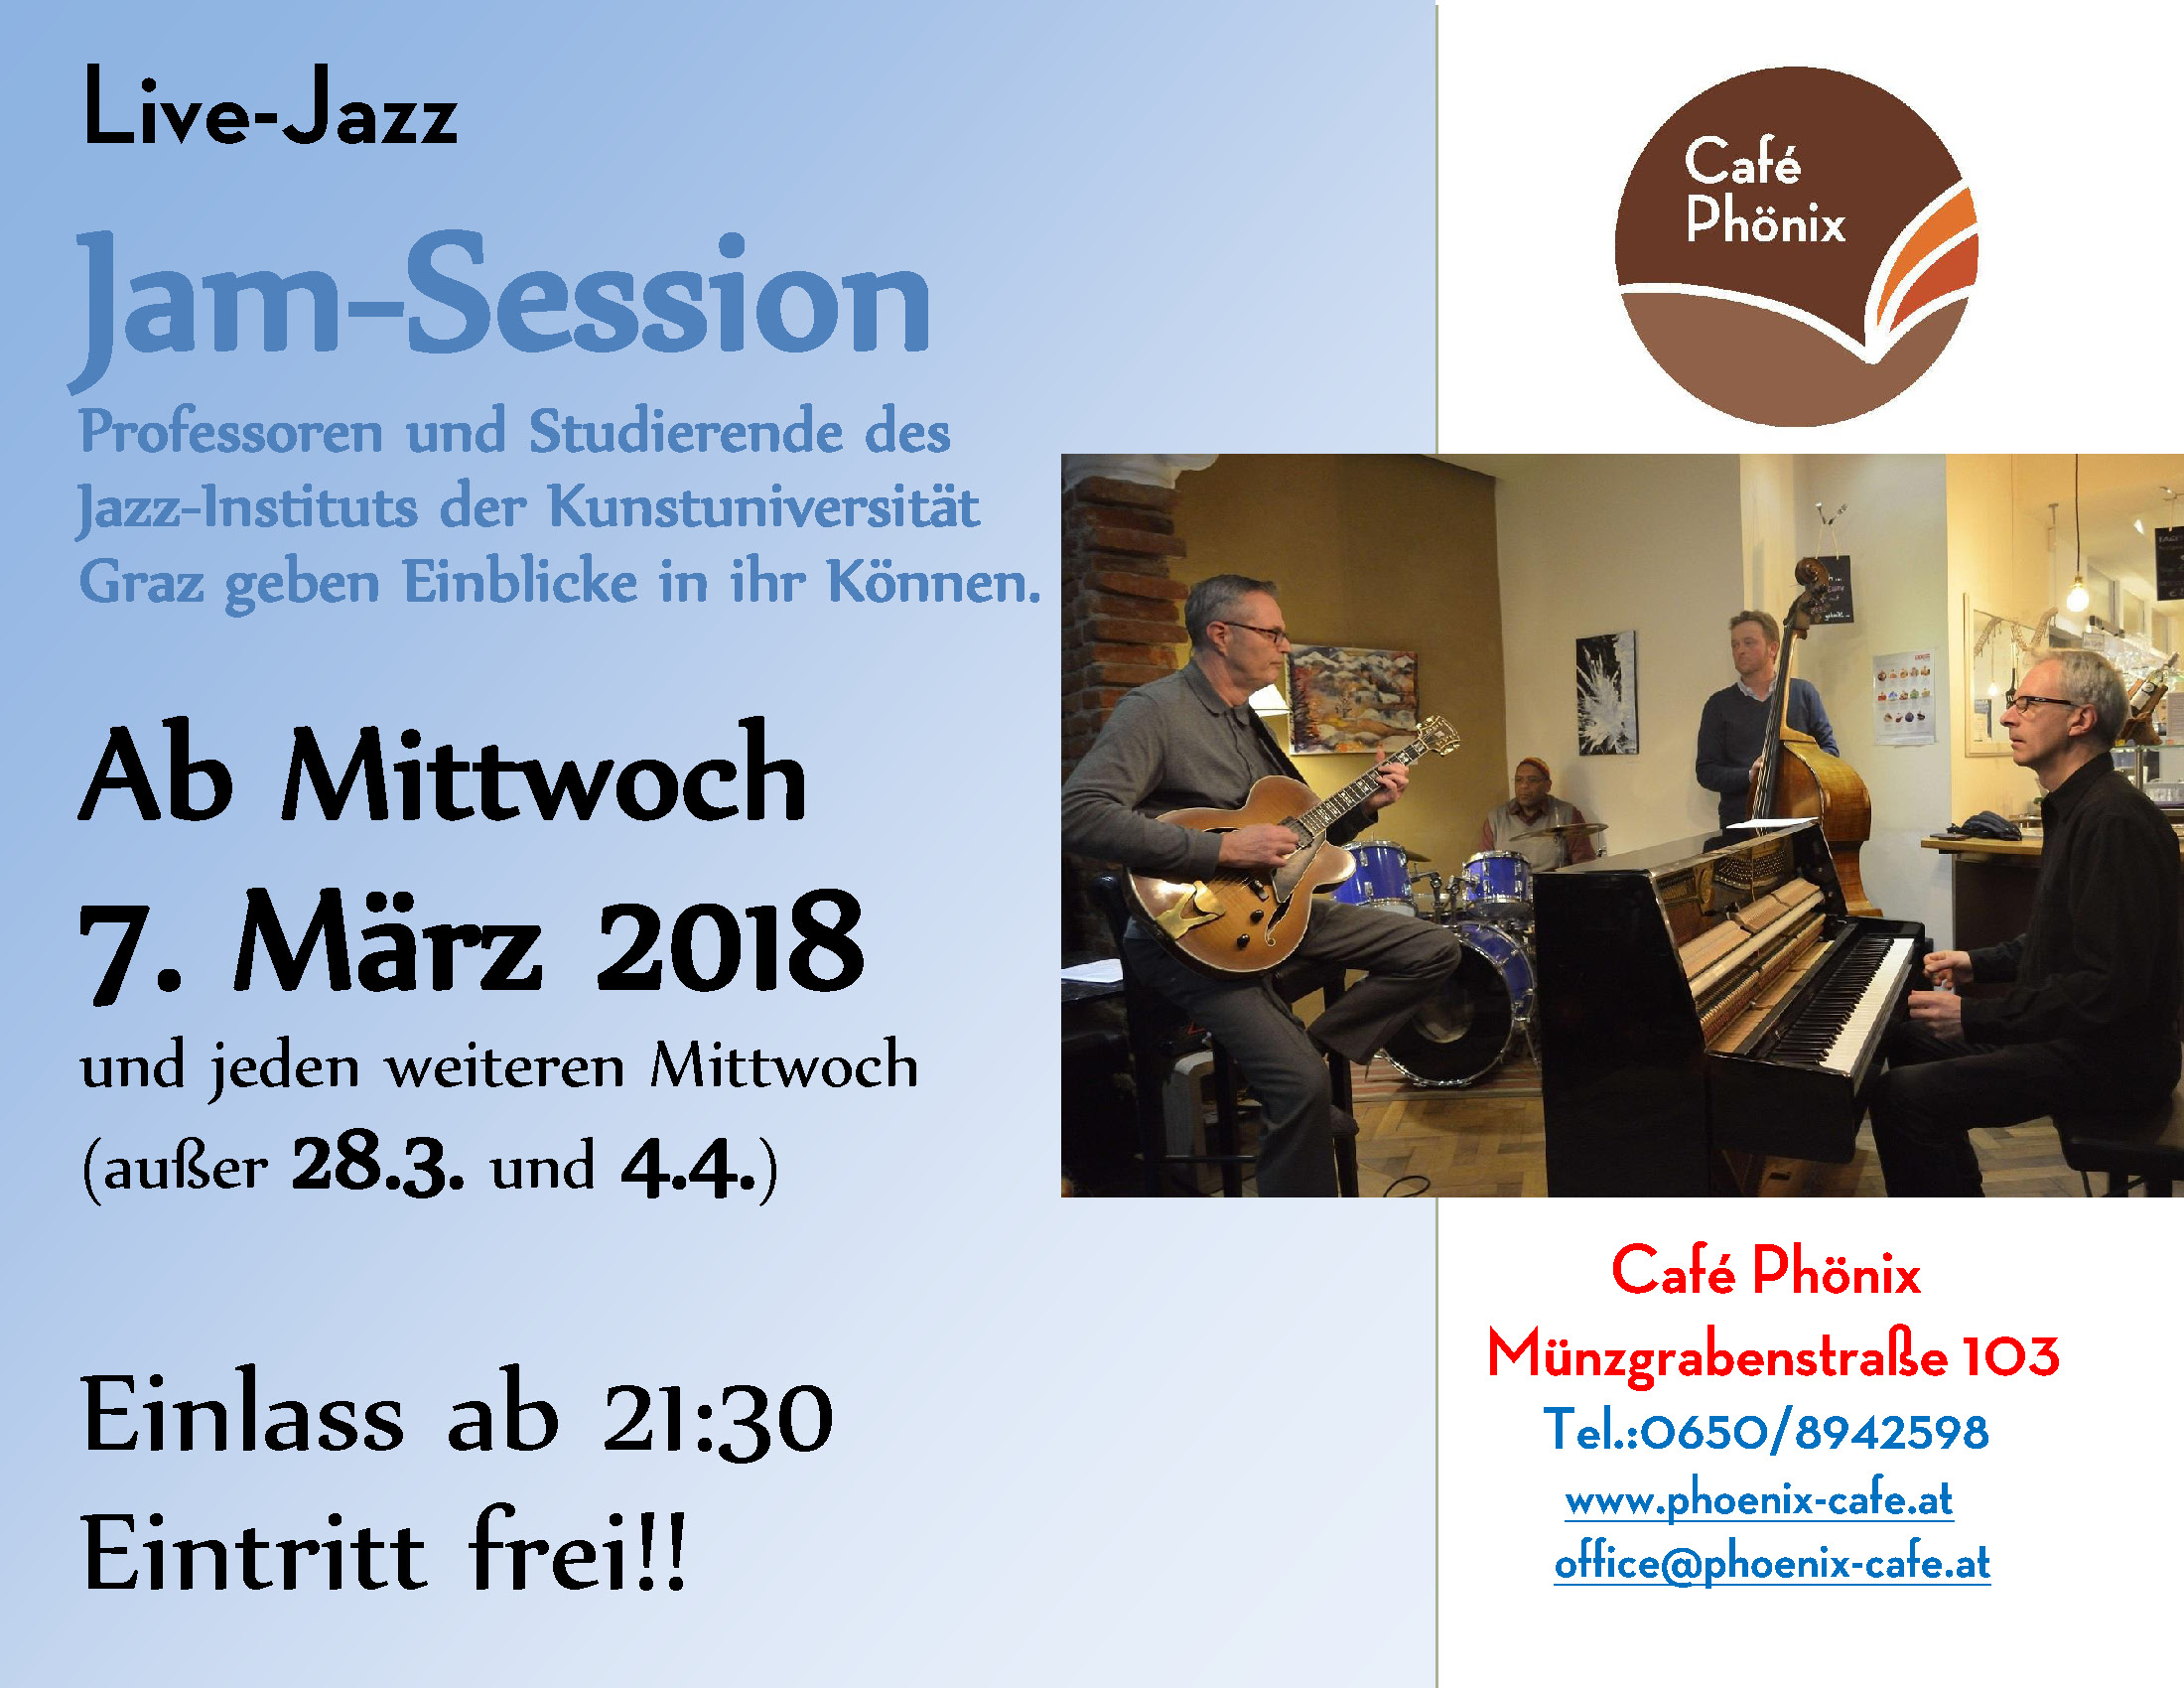 Live Jazz Musik!